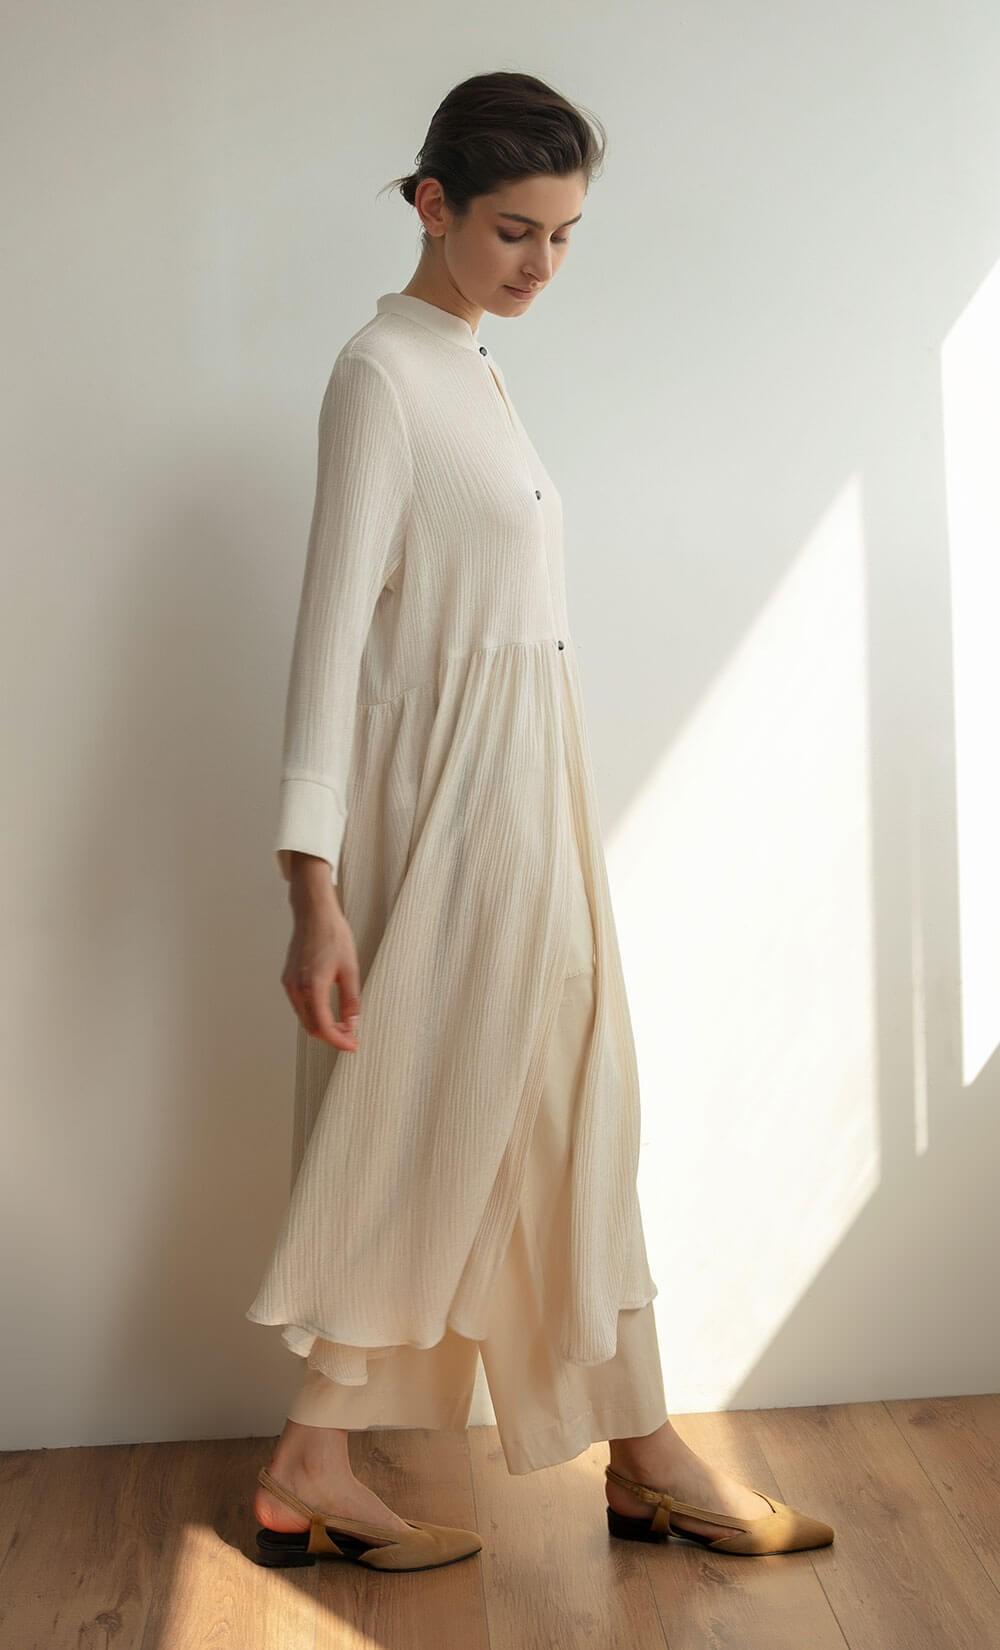 Camden Coat Dress